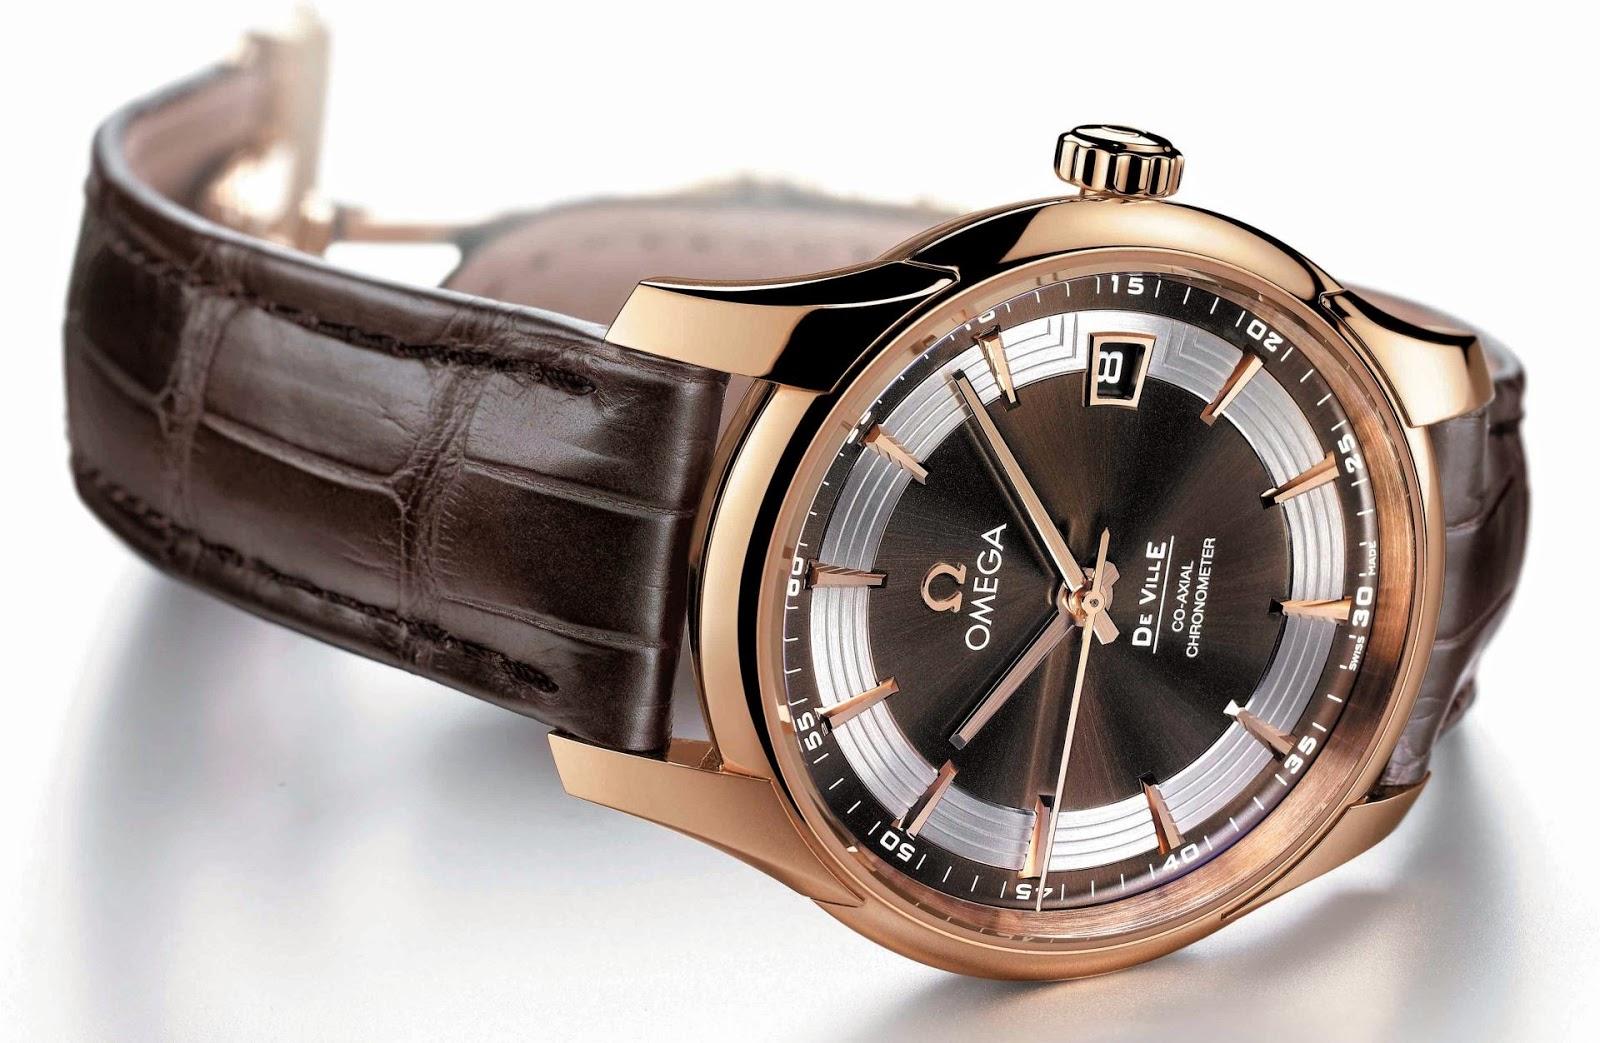 Omega De Ville Hour Vision replica watch